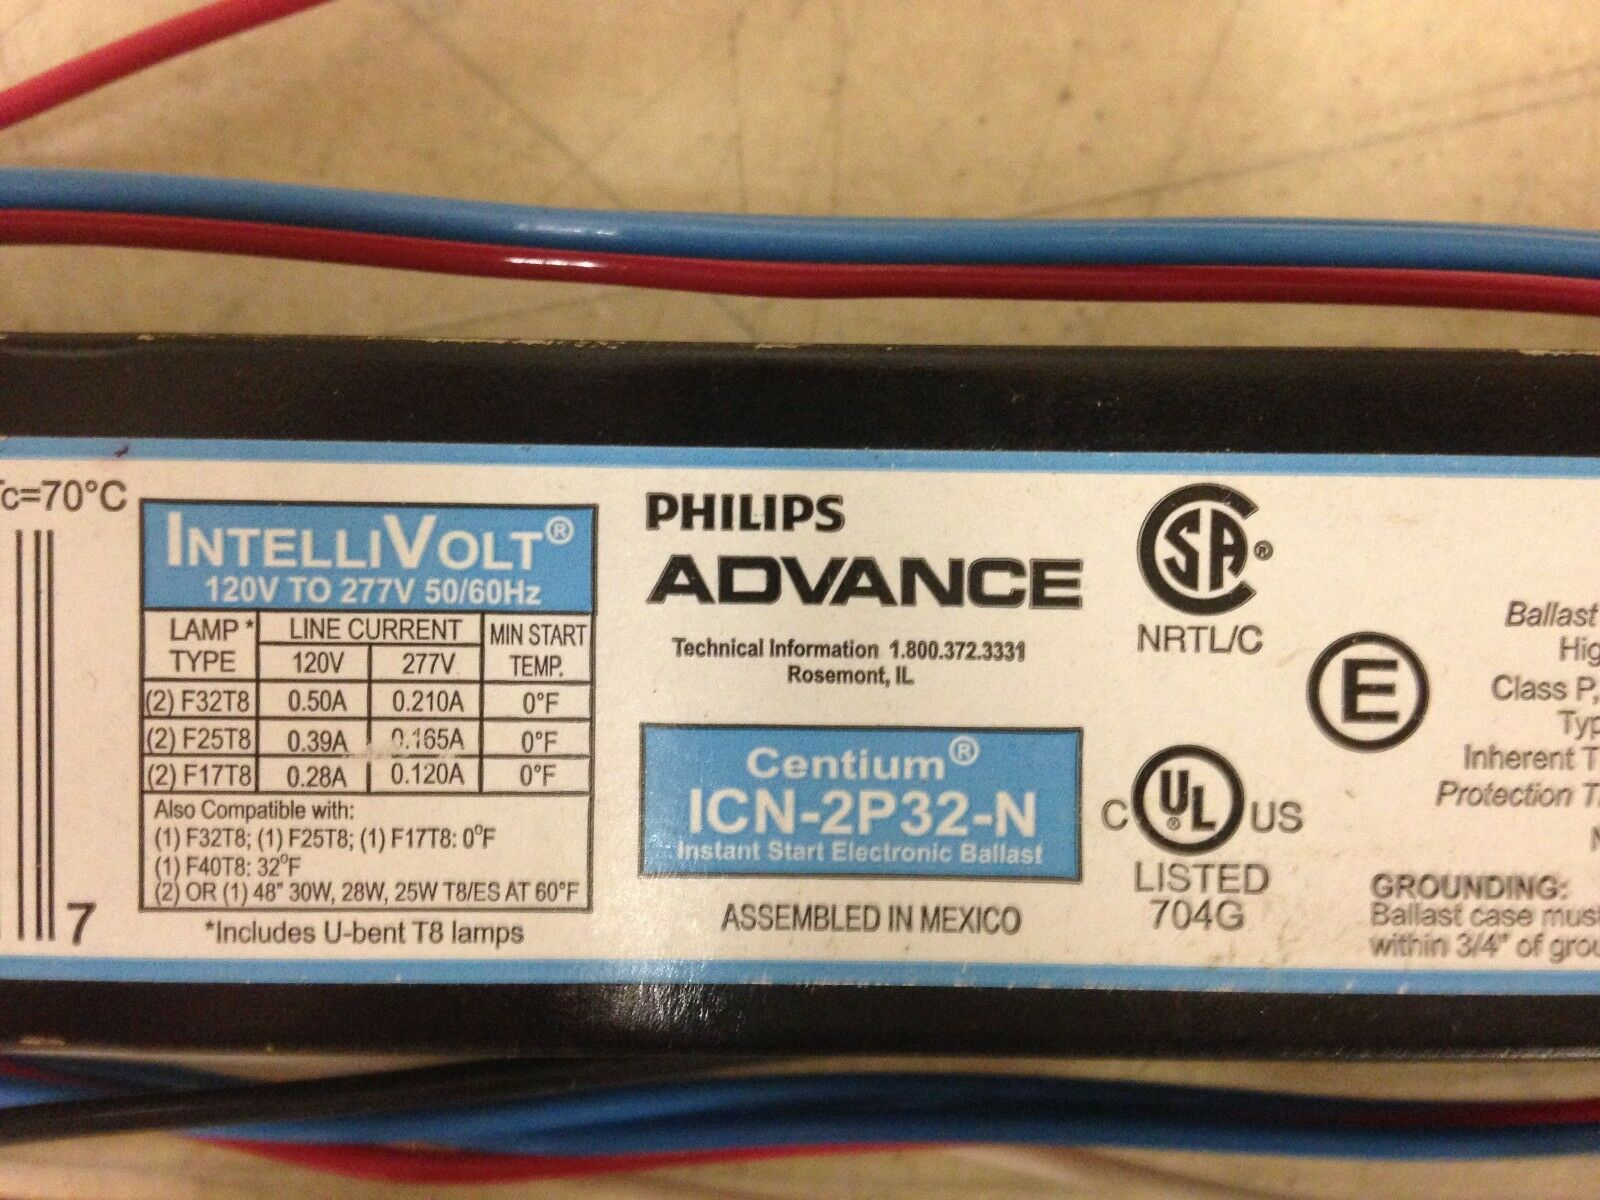 5x PHILLIPS ADVANCE Centium ICN-2P32-N Electronic Ballast,T8 Lamps,120V-277V NEW